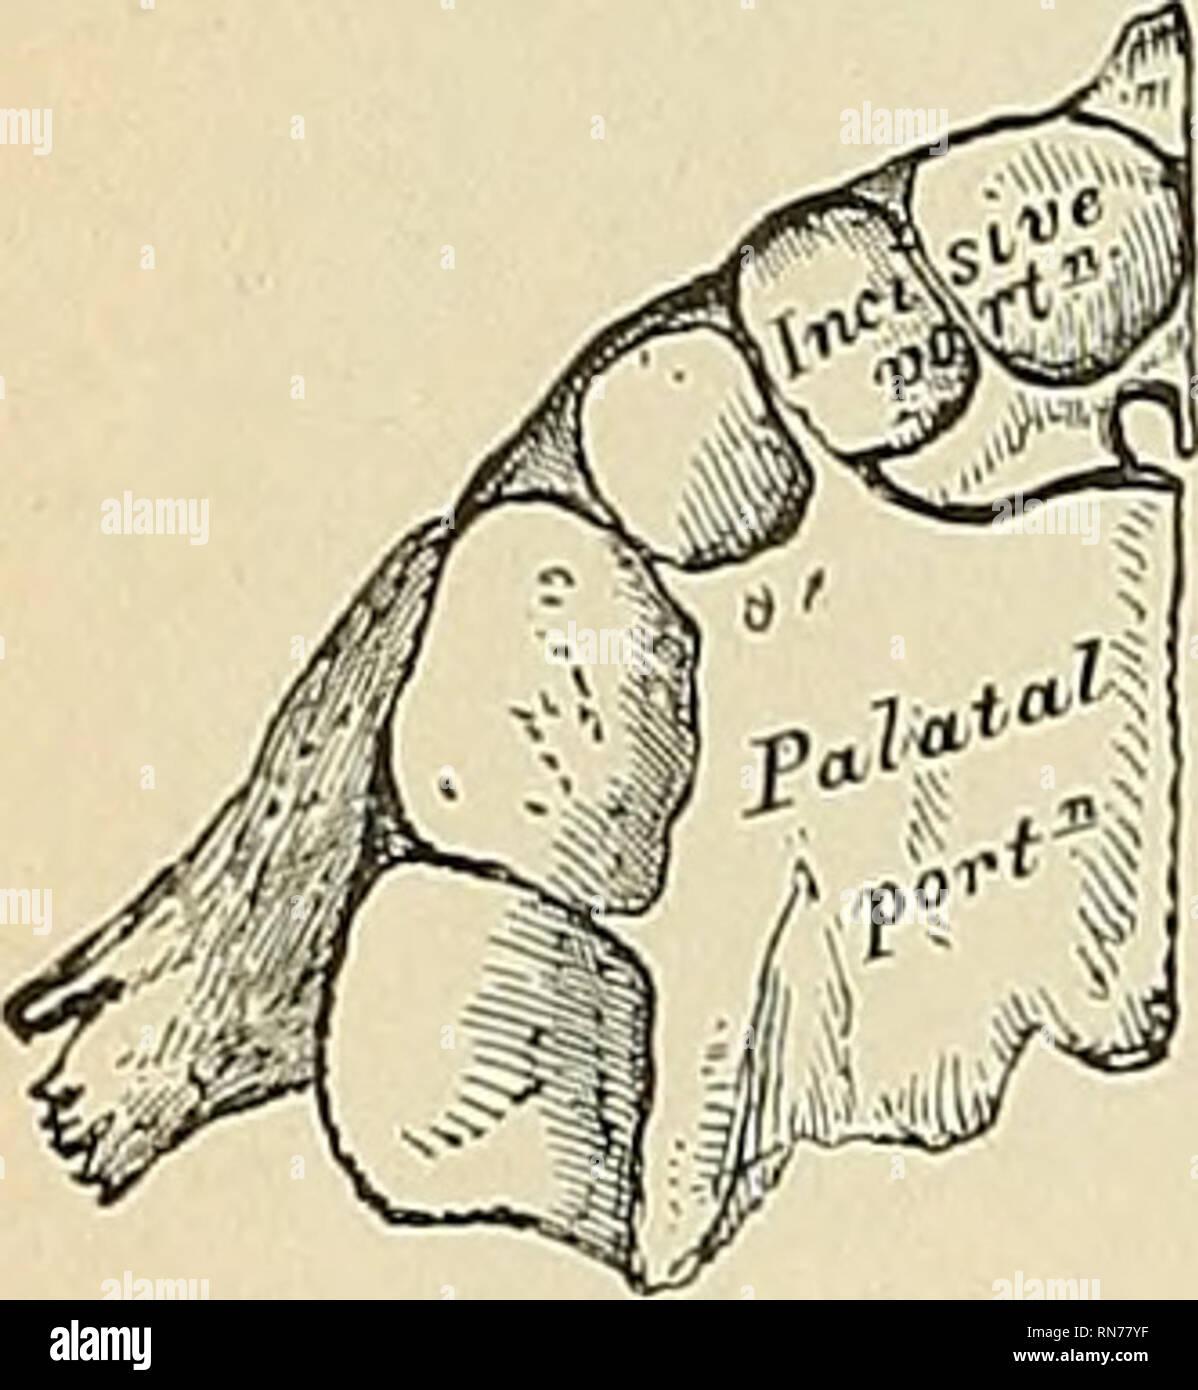 Anatomy Descriptive And Applied Anatomy Anterior Surjace Portion